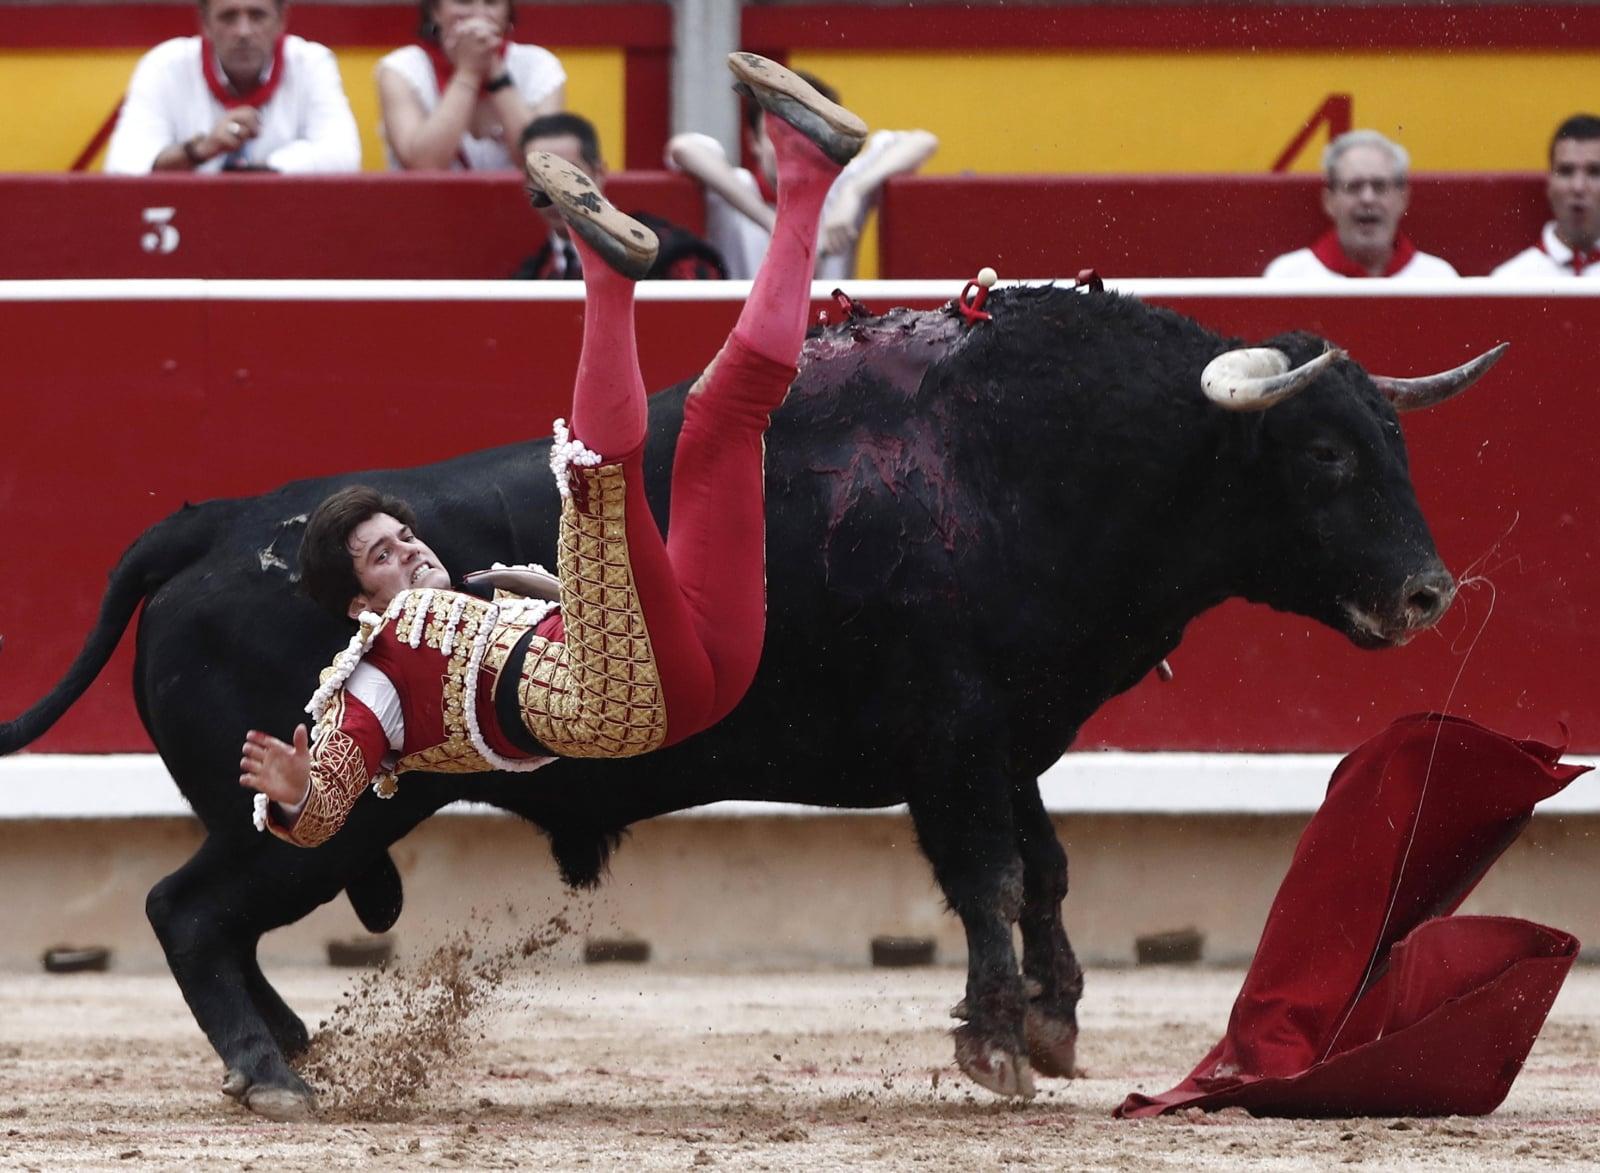 Hiszpan Jose Garrido w czasie walki z bykiem, Pampeluna, Hiszpania. Fot. PAP/EPA/Jesus Diges